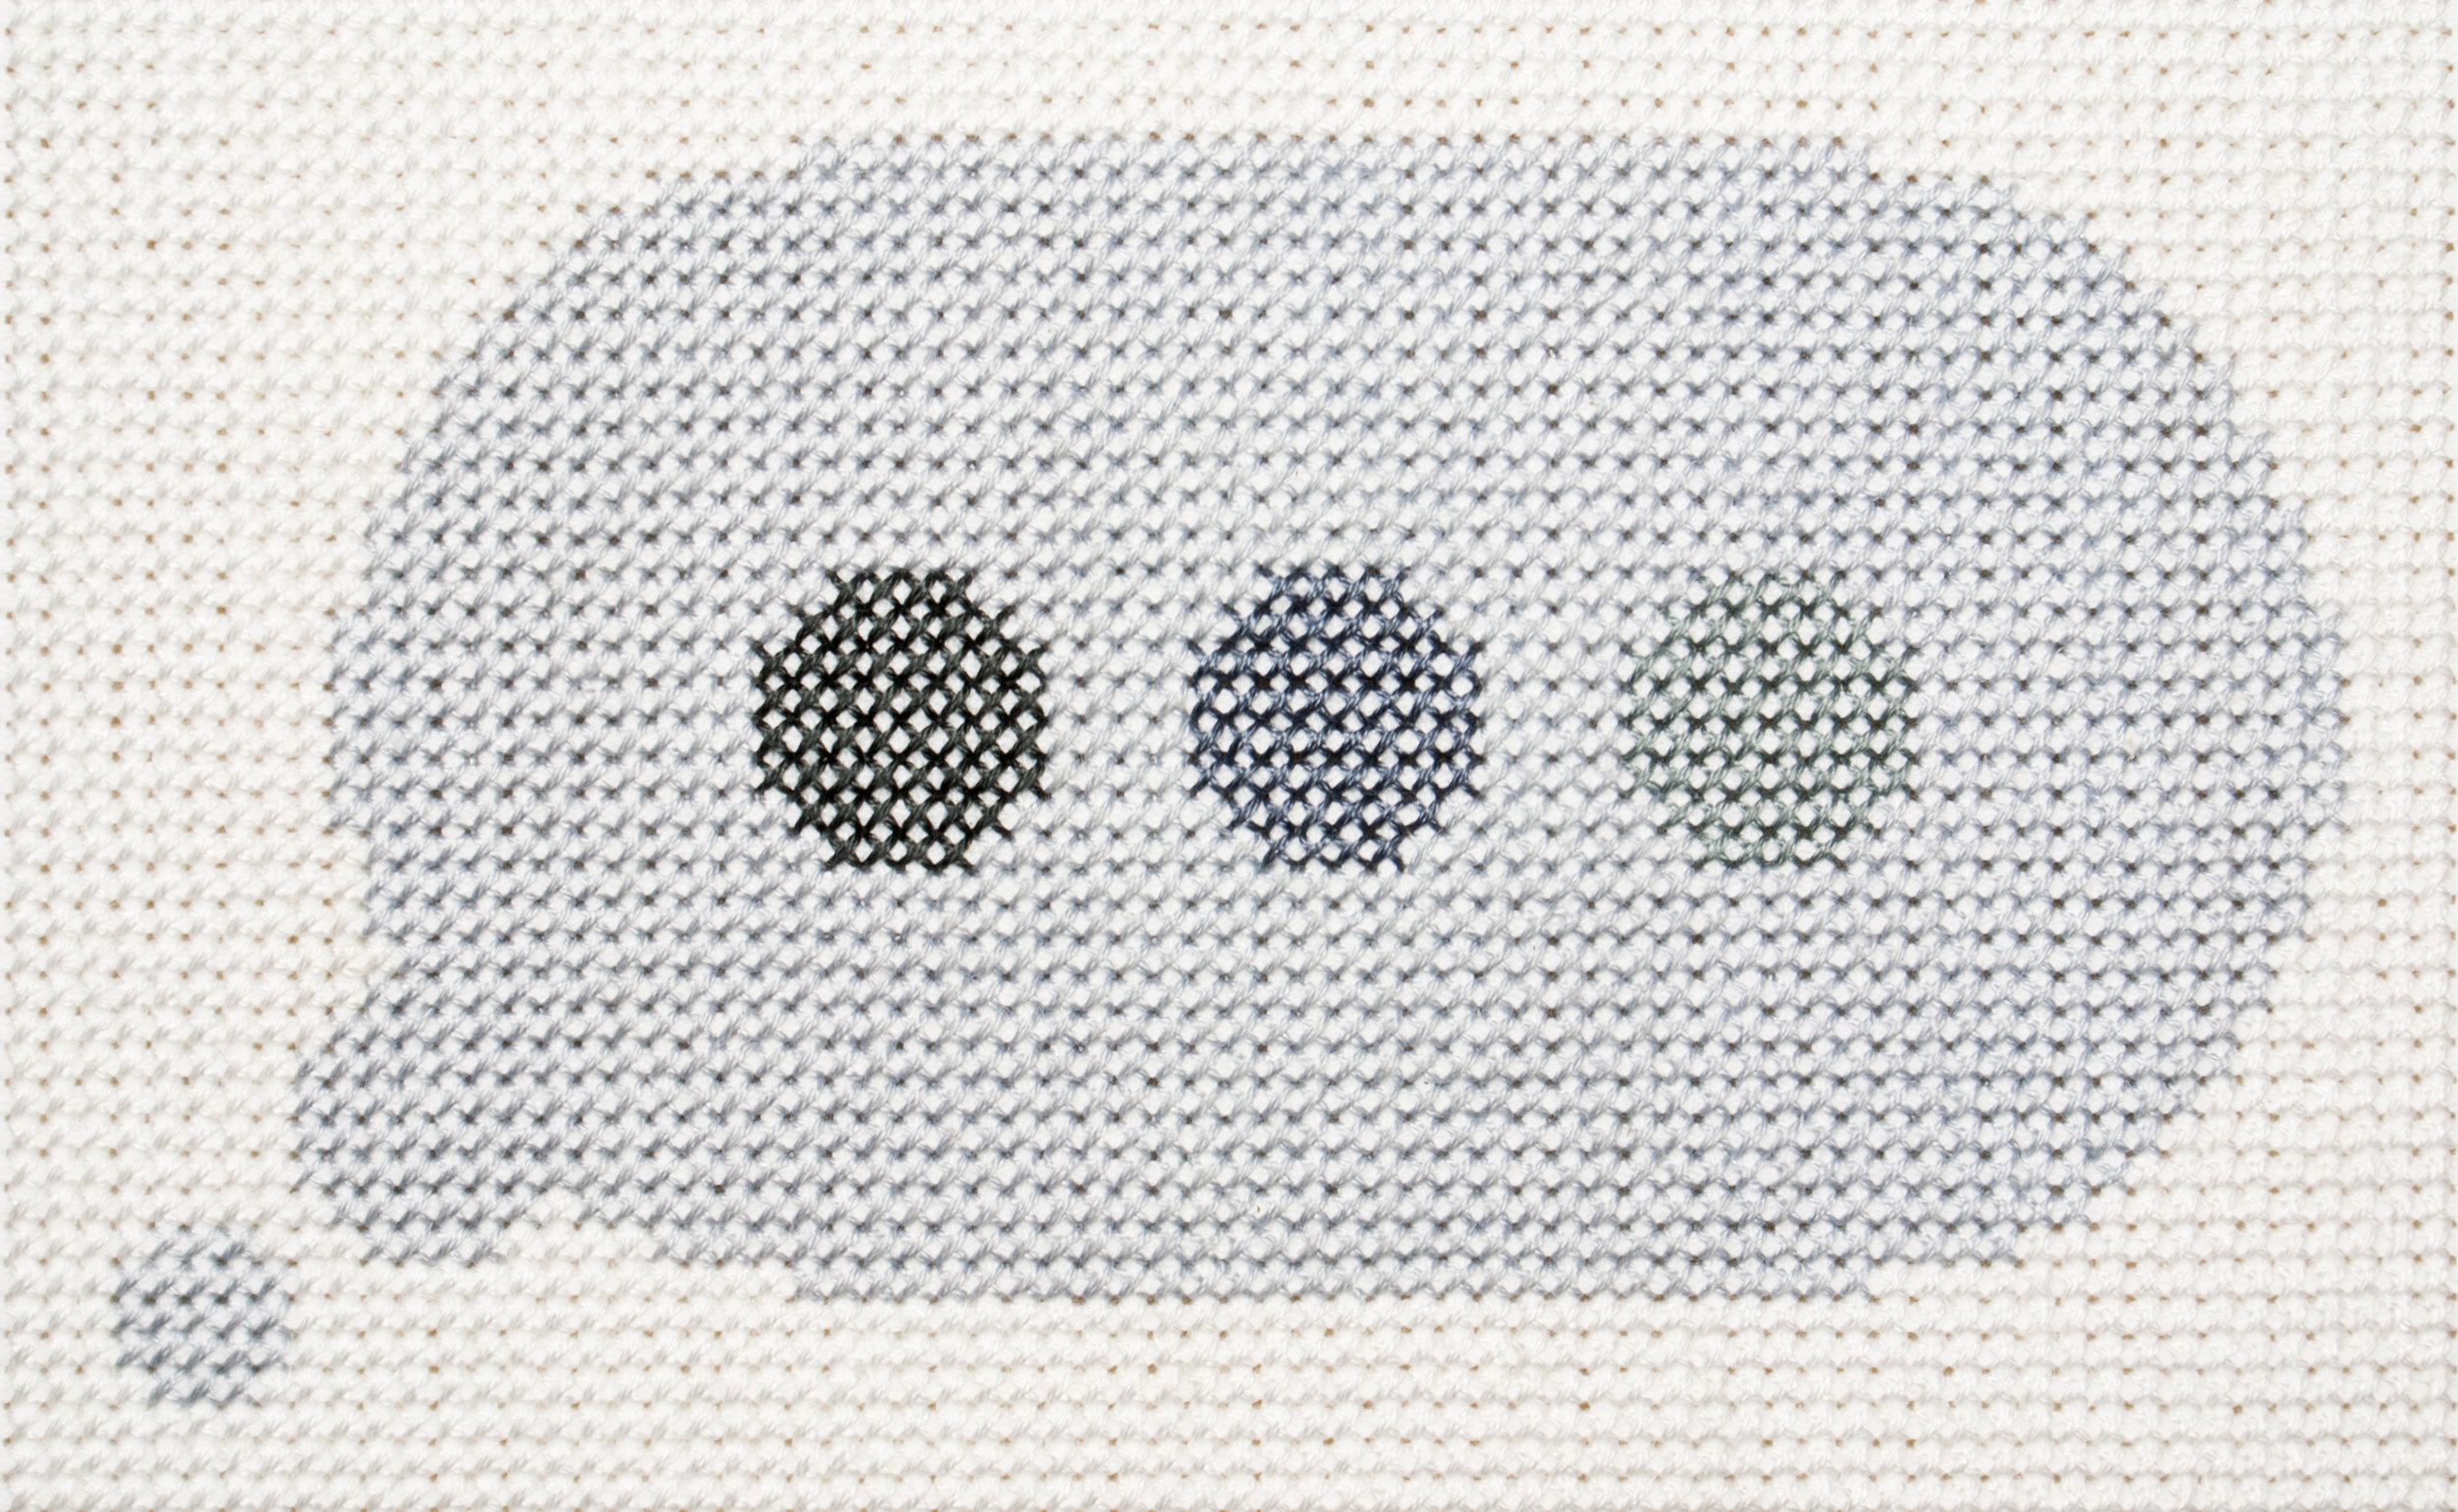 …   Frame 3  Cotton thread on aida cloth  4 x 6.25 inches  2017